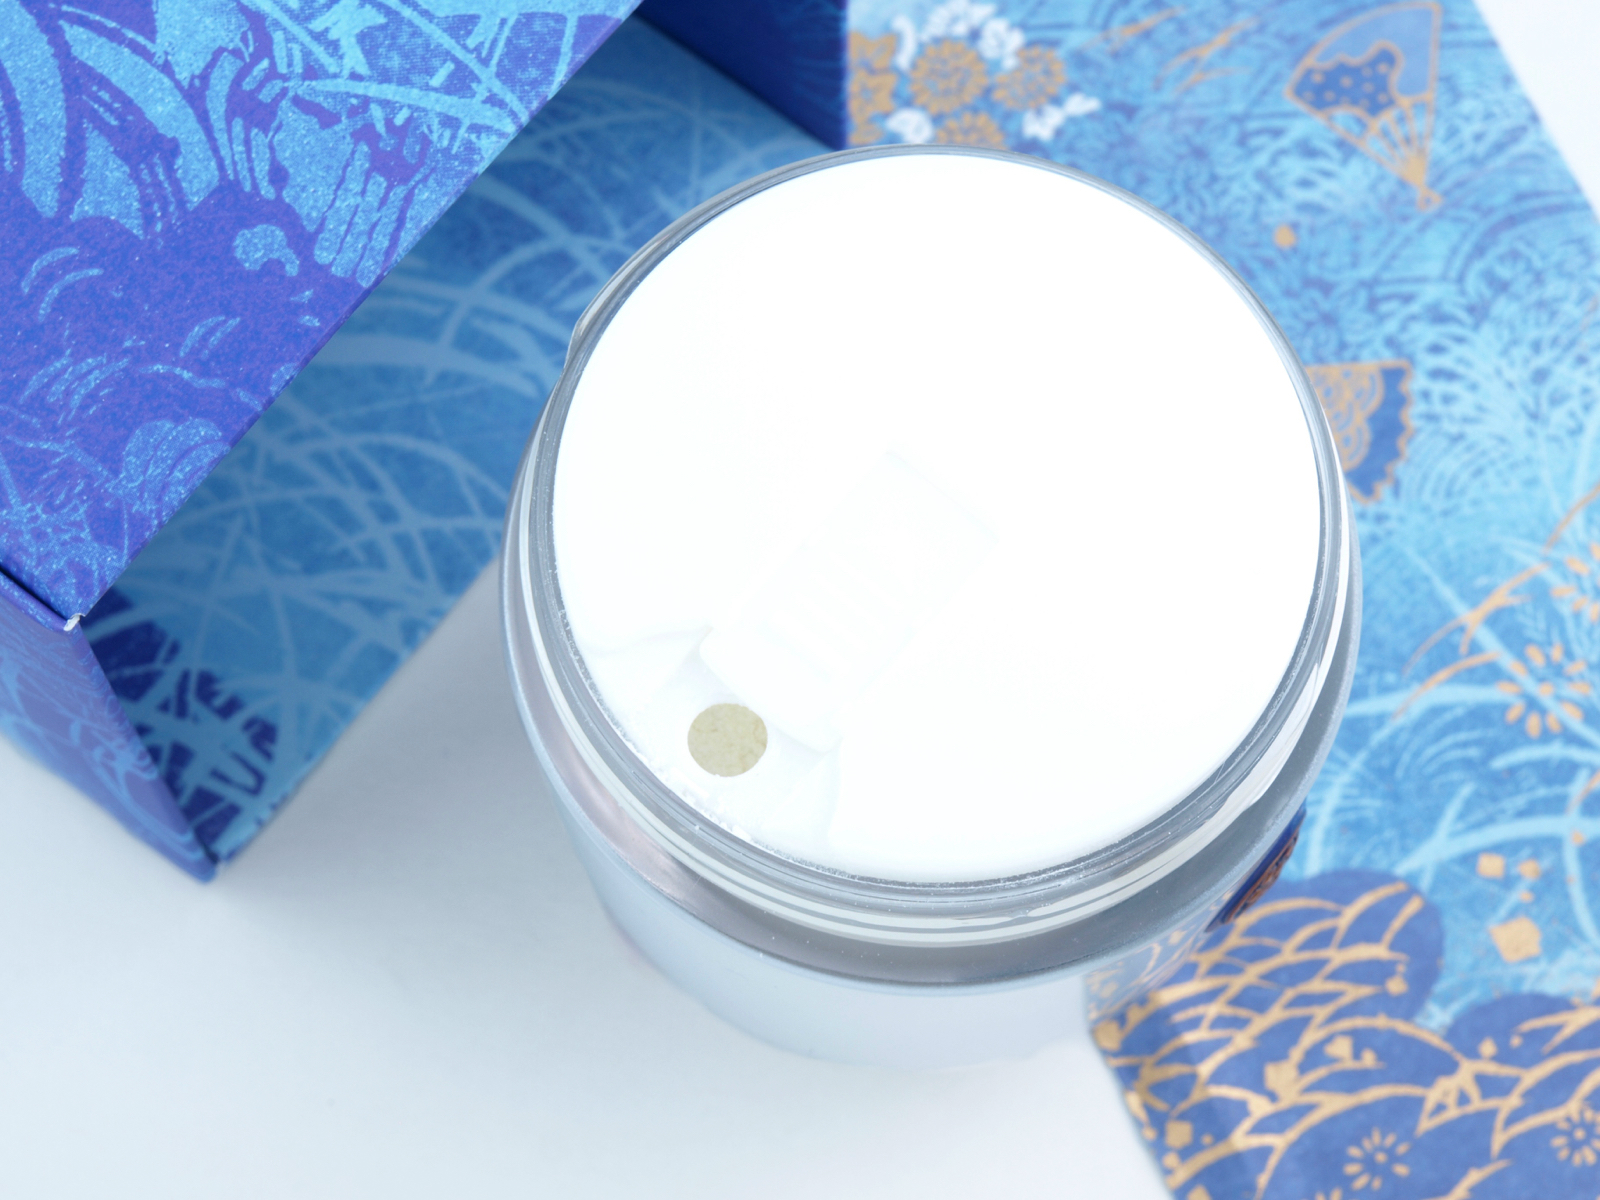 Tatcha Polished Classic Rice Enzyme Powder: Review